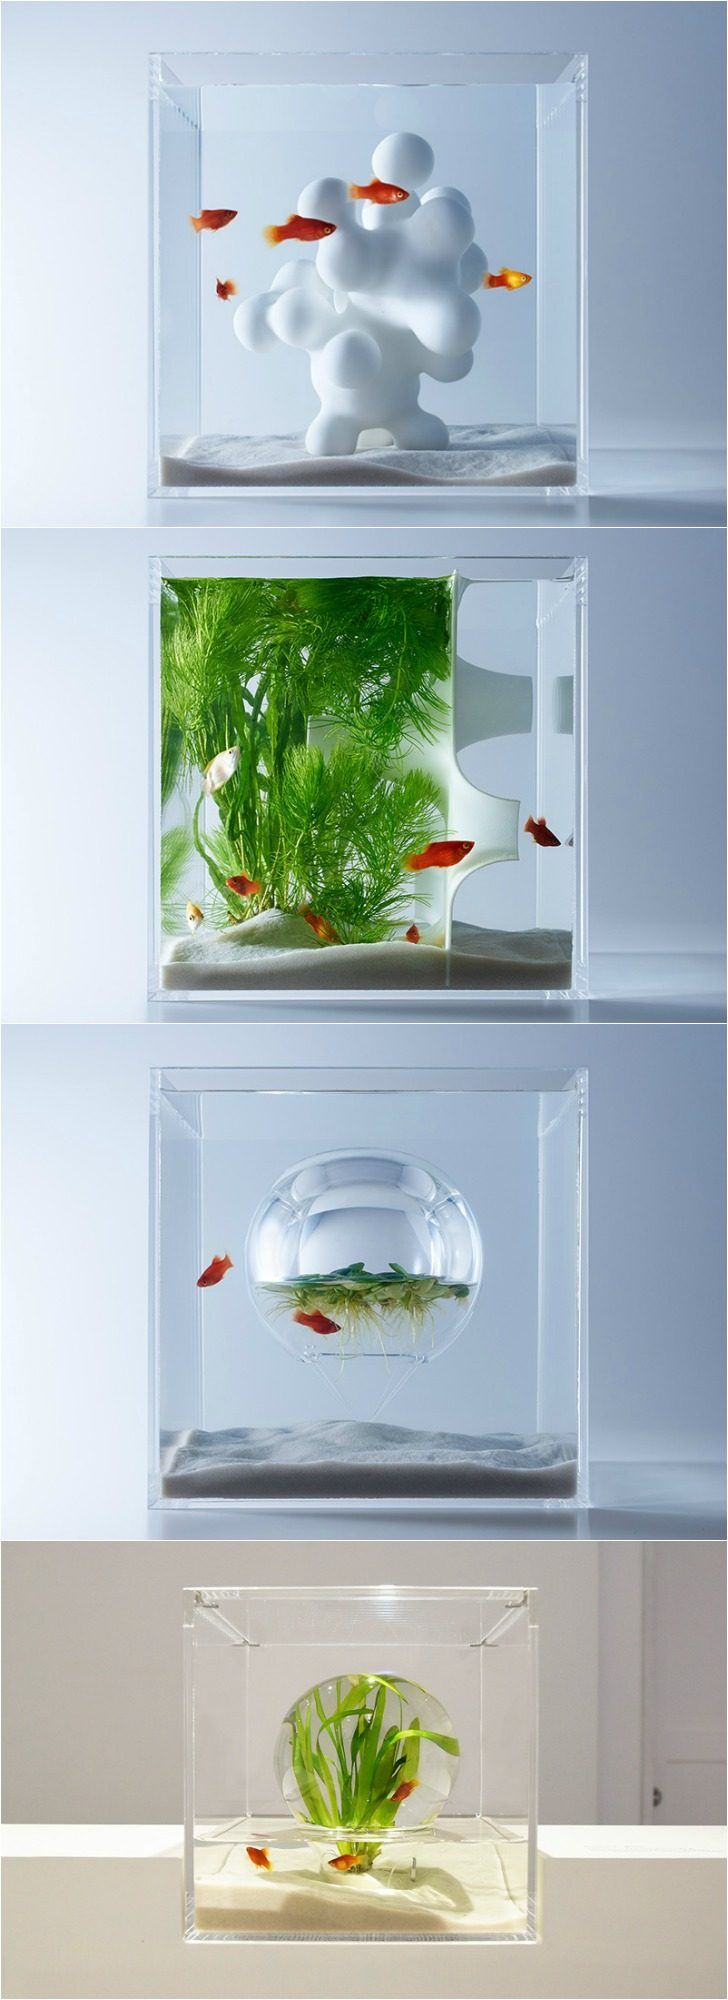 Artistic aquariums from haruka misawa poissons aquarium for Poisson decoration aquarium